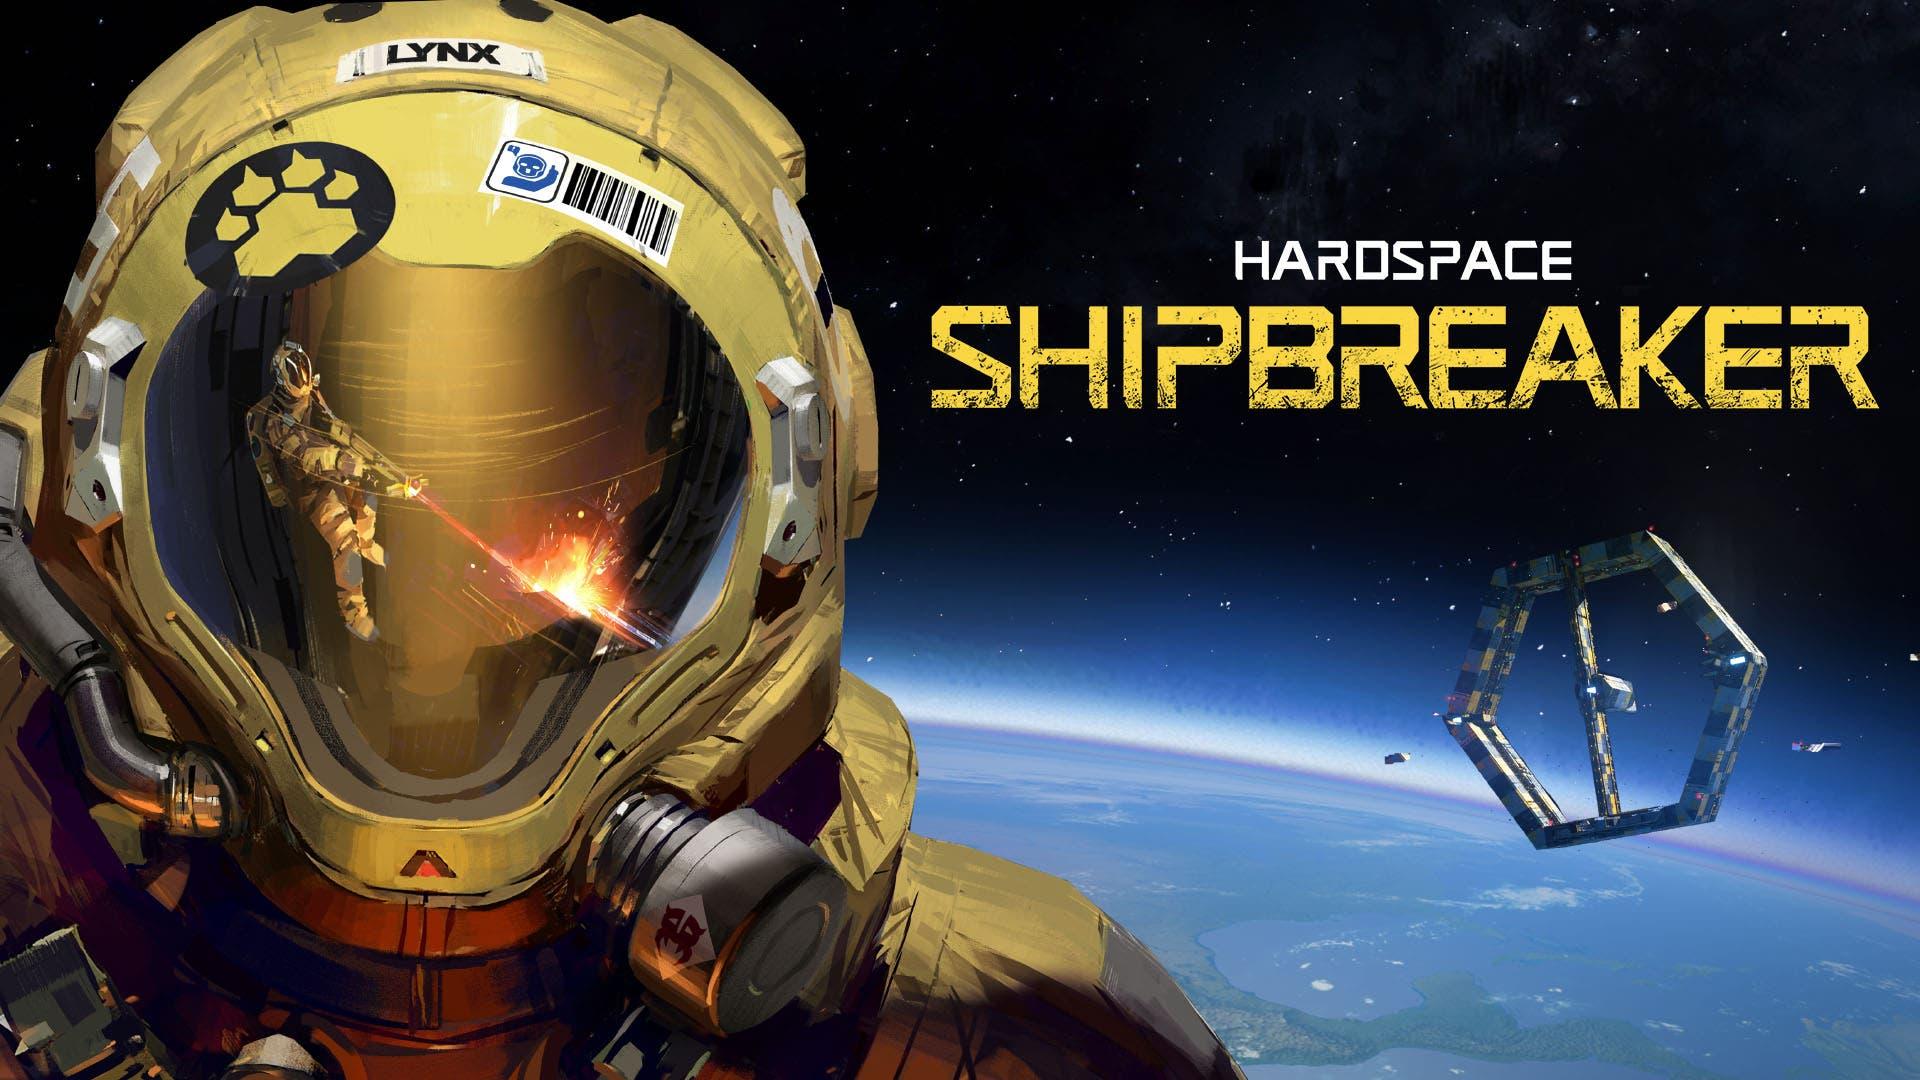 HardspaceShipbreaker earlyaccesspreview thumb bg